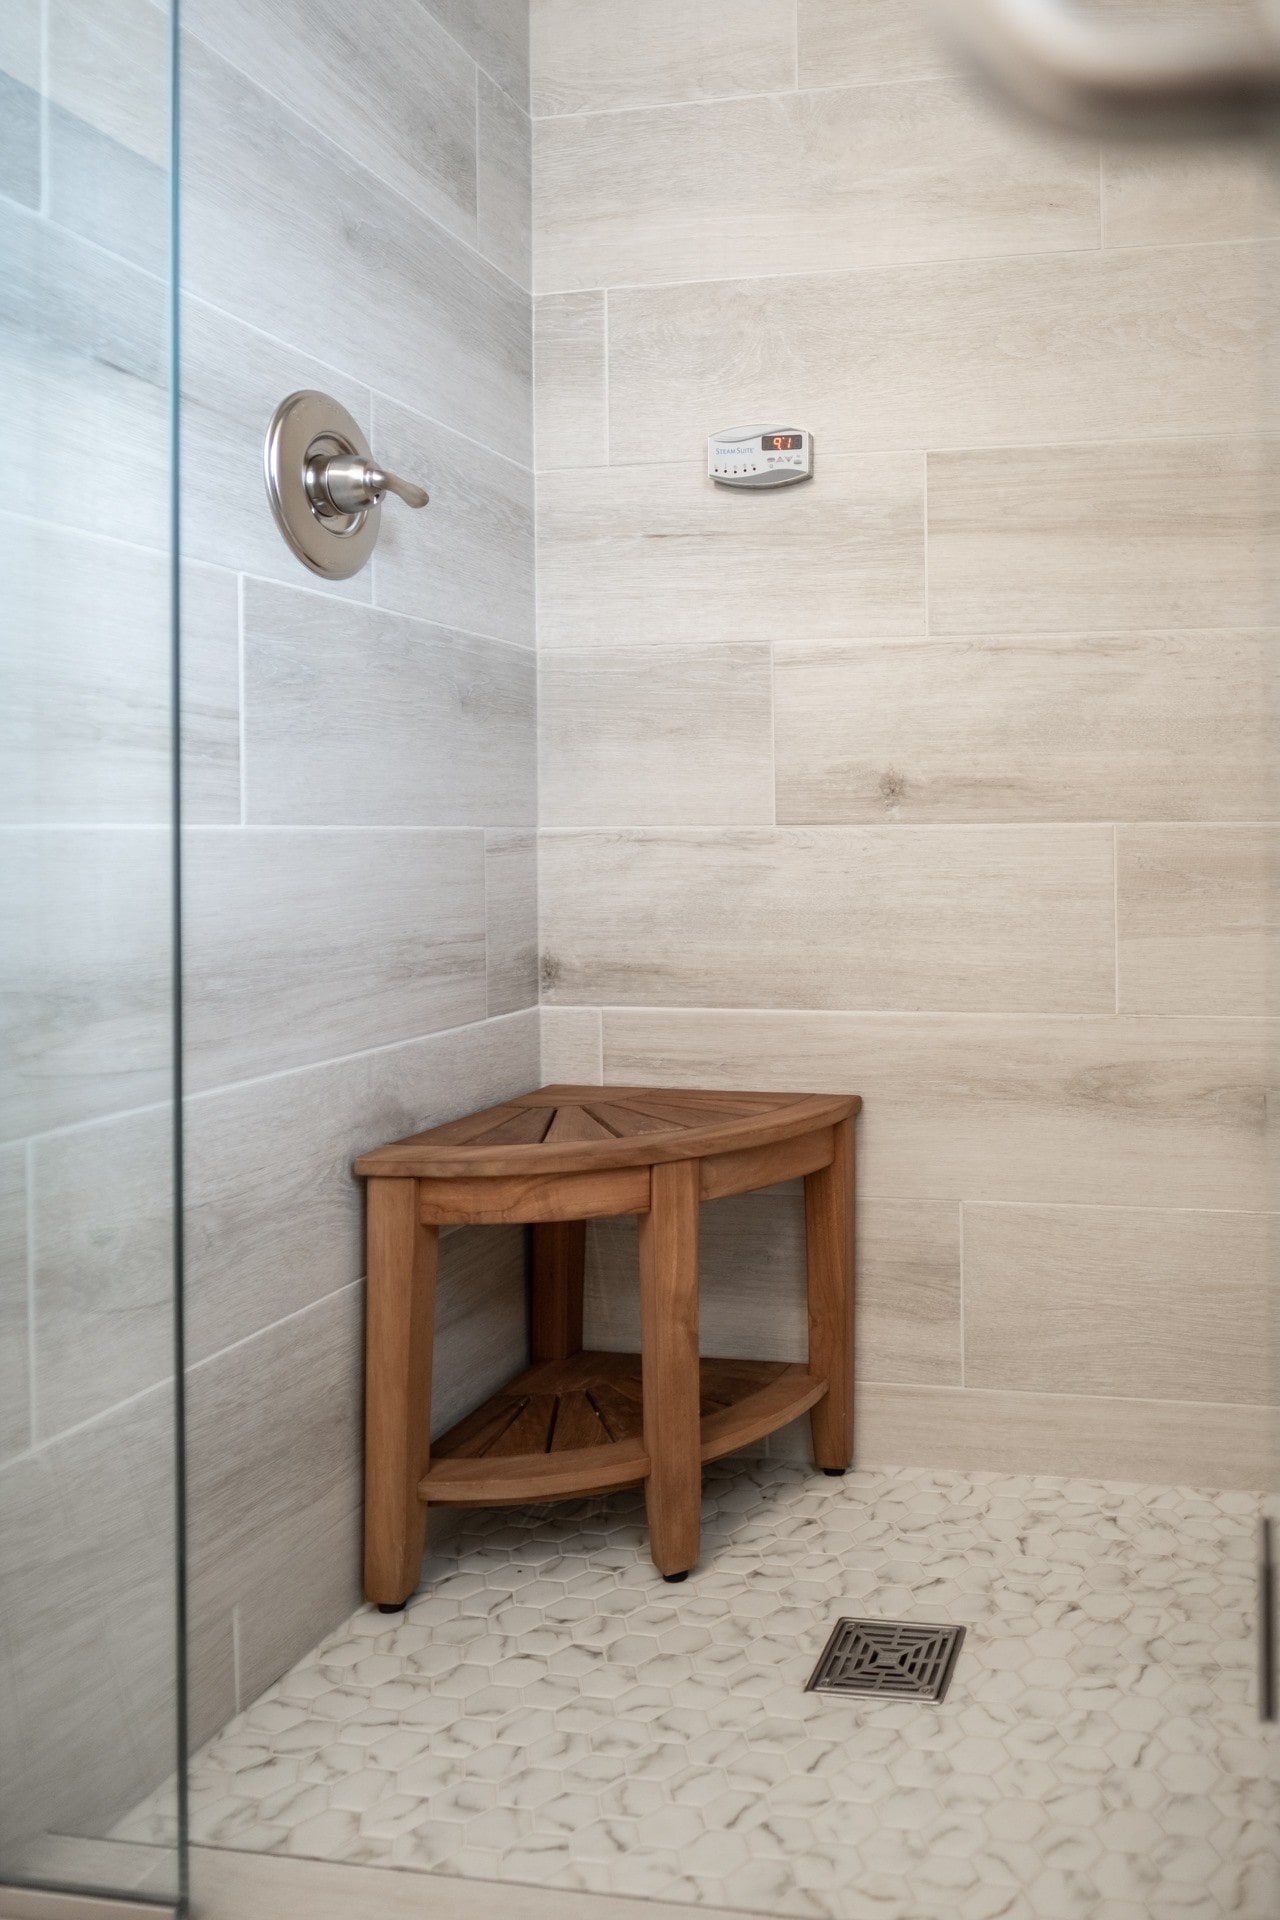 Custom Shower Tile In Milestone Floor Coverings International Regina